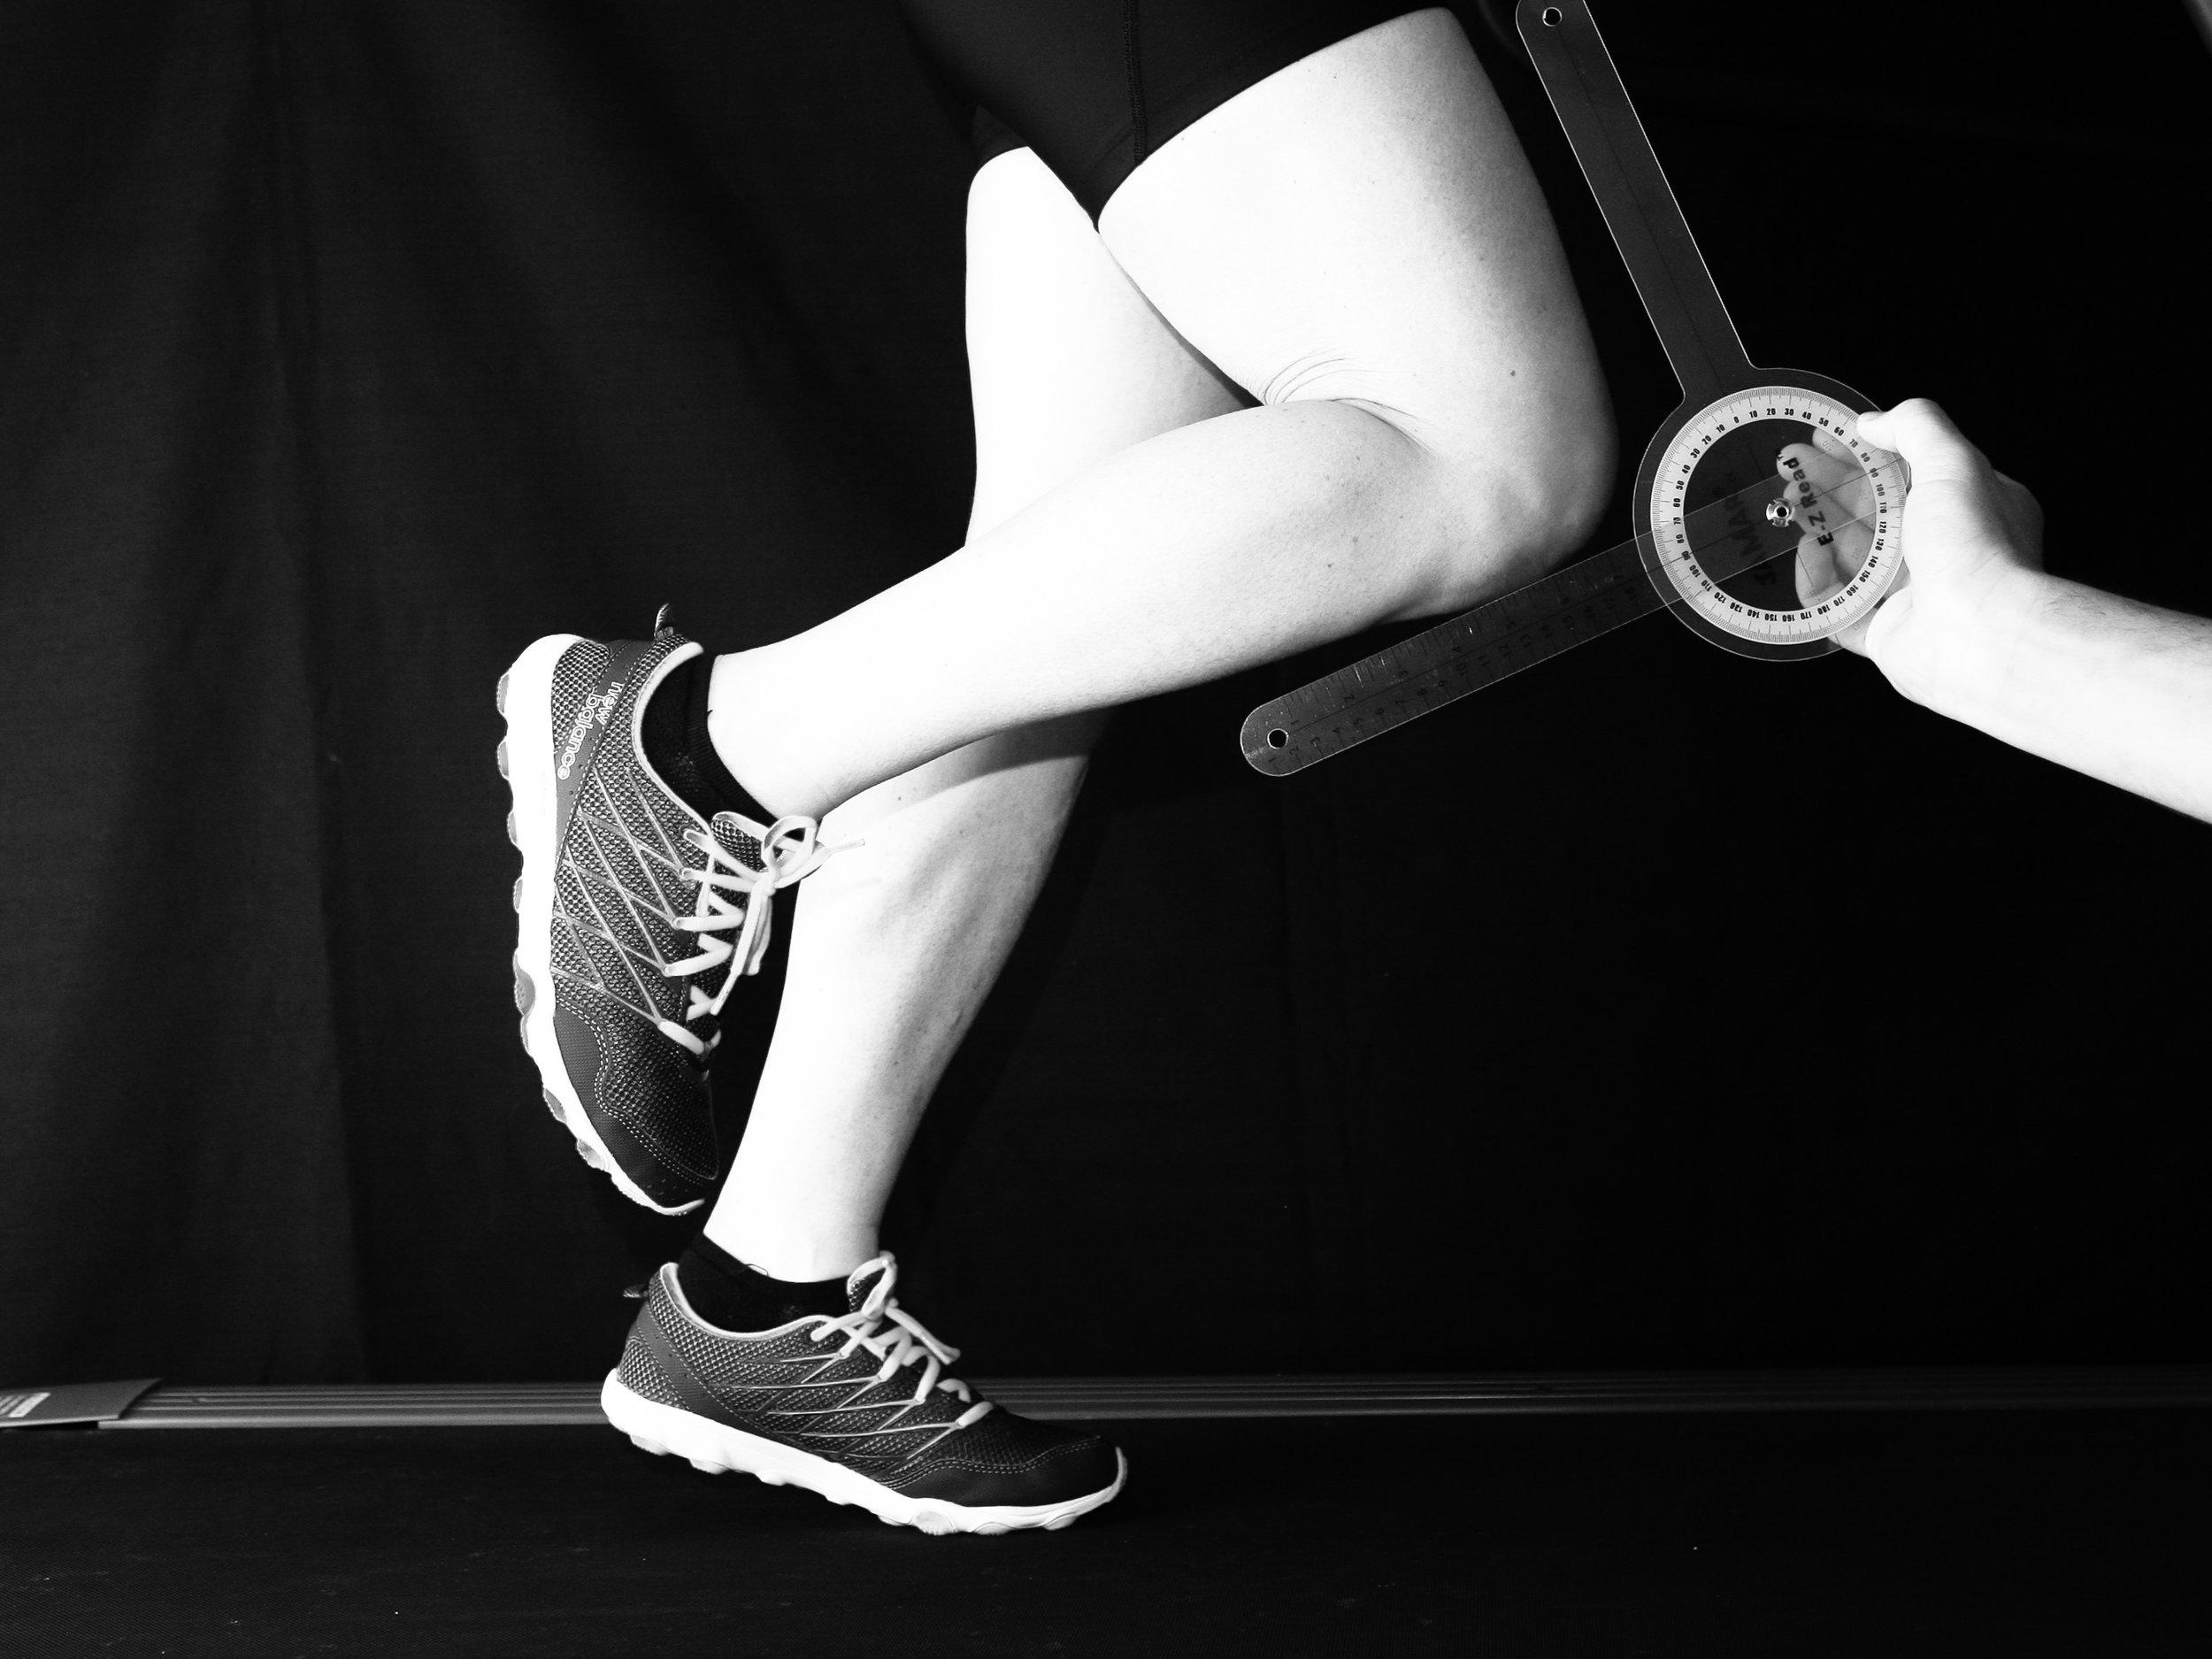 Reactivate Muskoka Sport and Exercise Medicine Gait Analysis